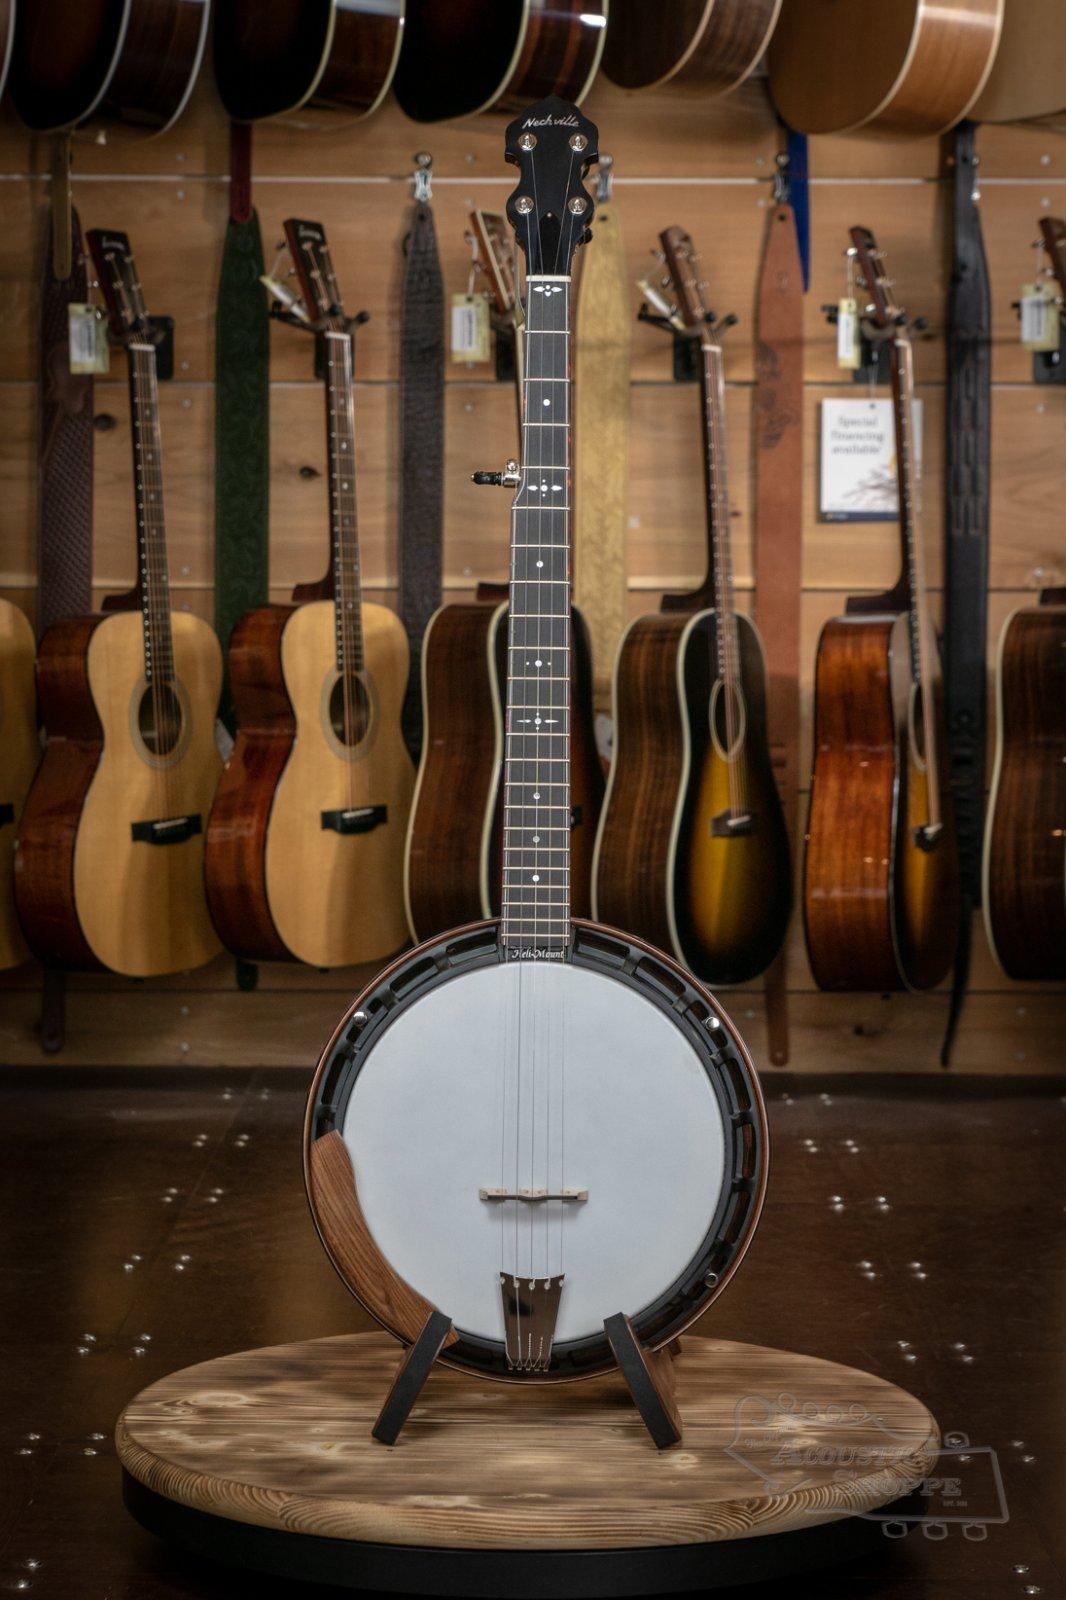 Nechville Aries #2424 Walnut Resonator Banjo w/ Black Heli